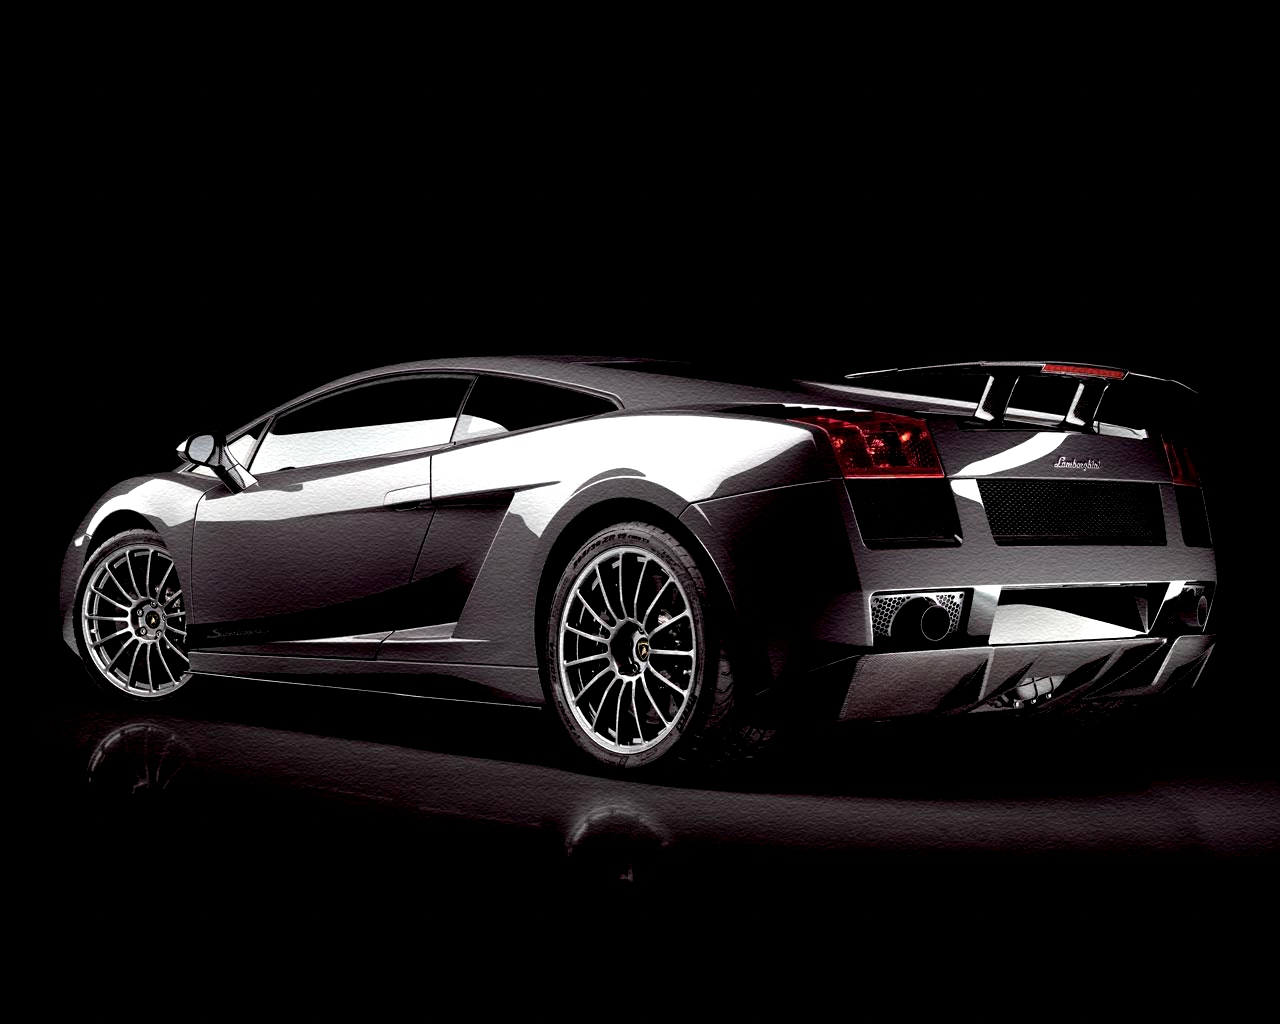 Matte Black Luxury Car Wallpaper Luxury Lamborghini Cars Lamborghini Gallardo Black